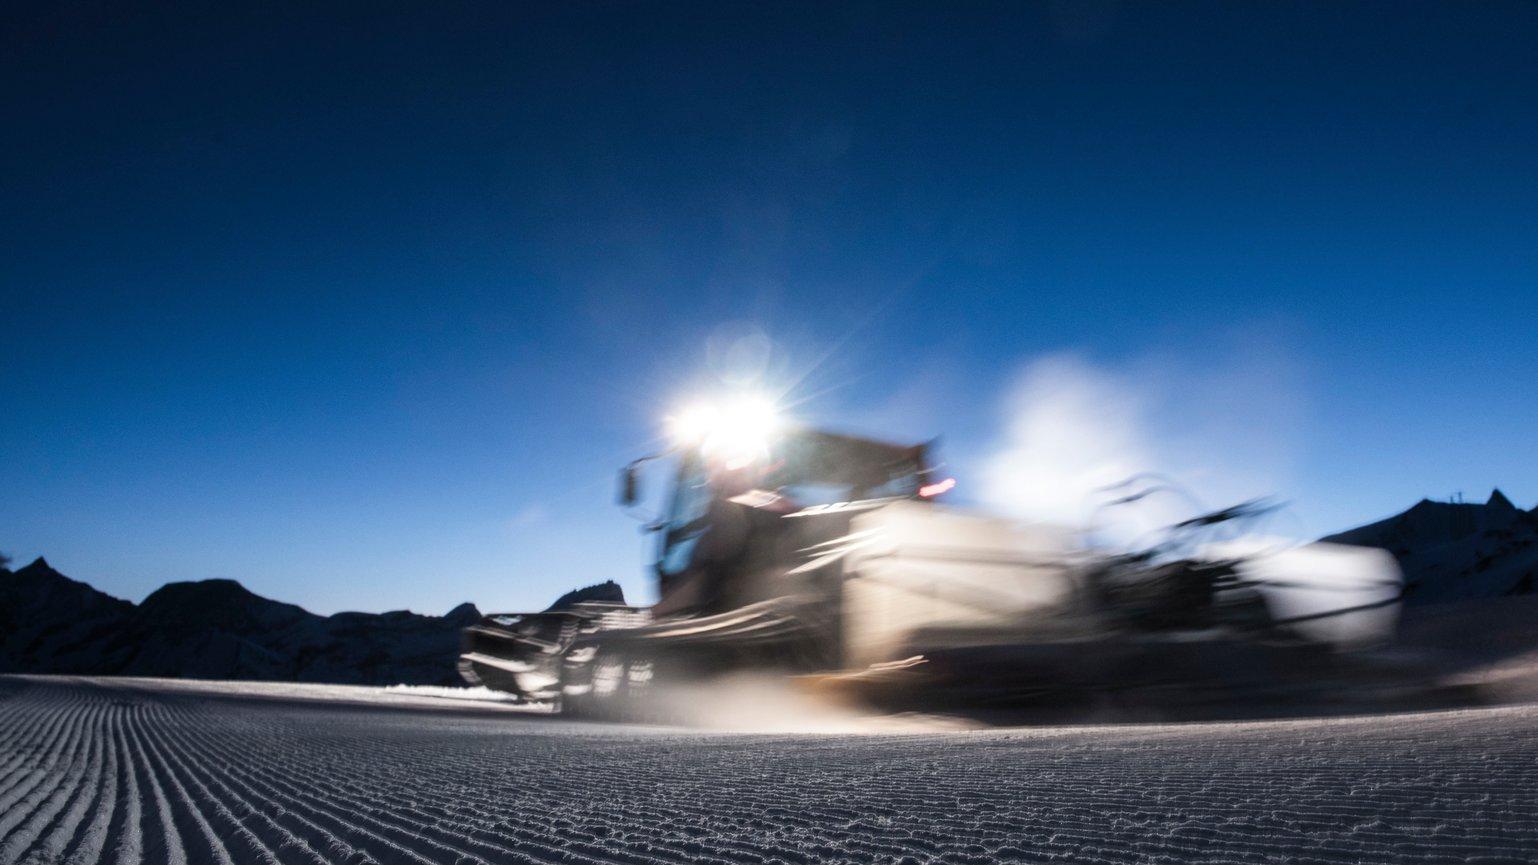 Winter experience: driving a PistenBully | Zermatt Bergbahnen